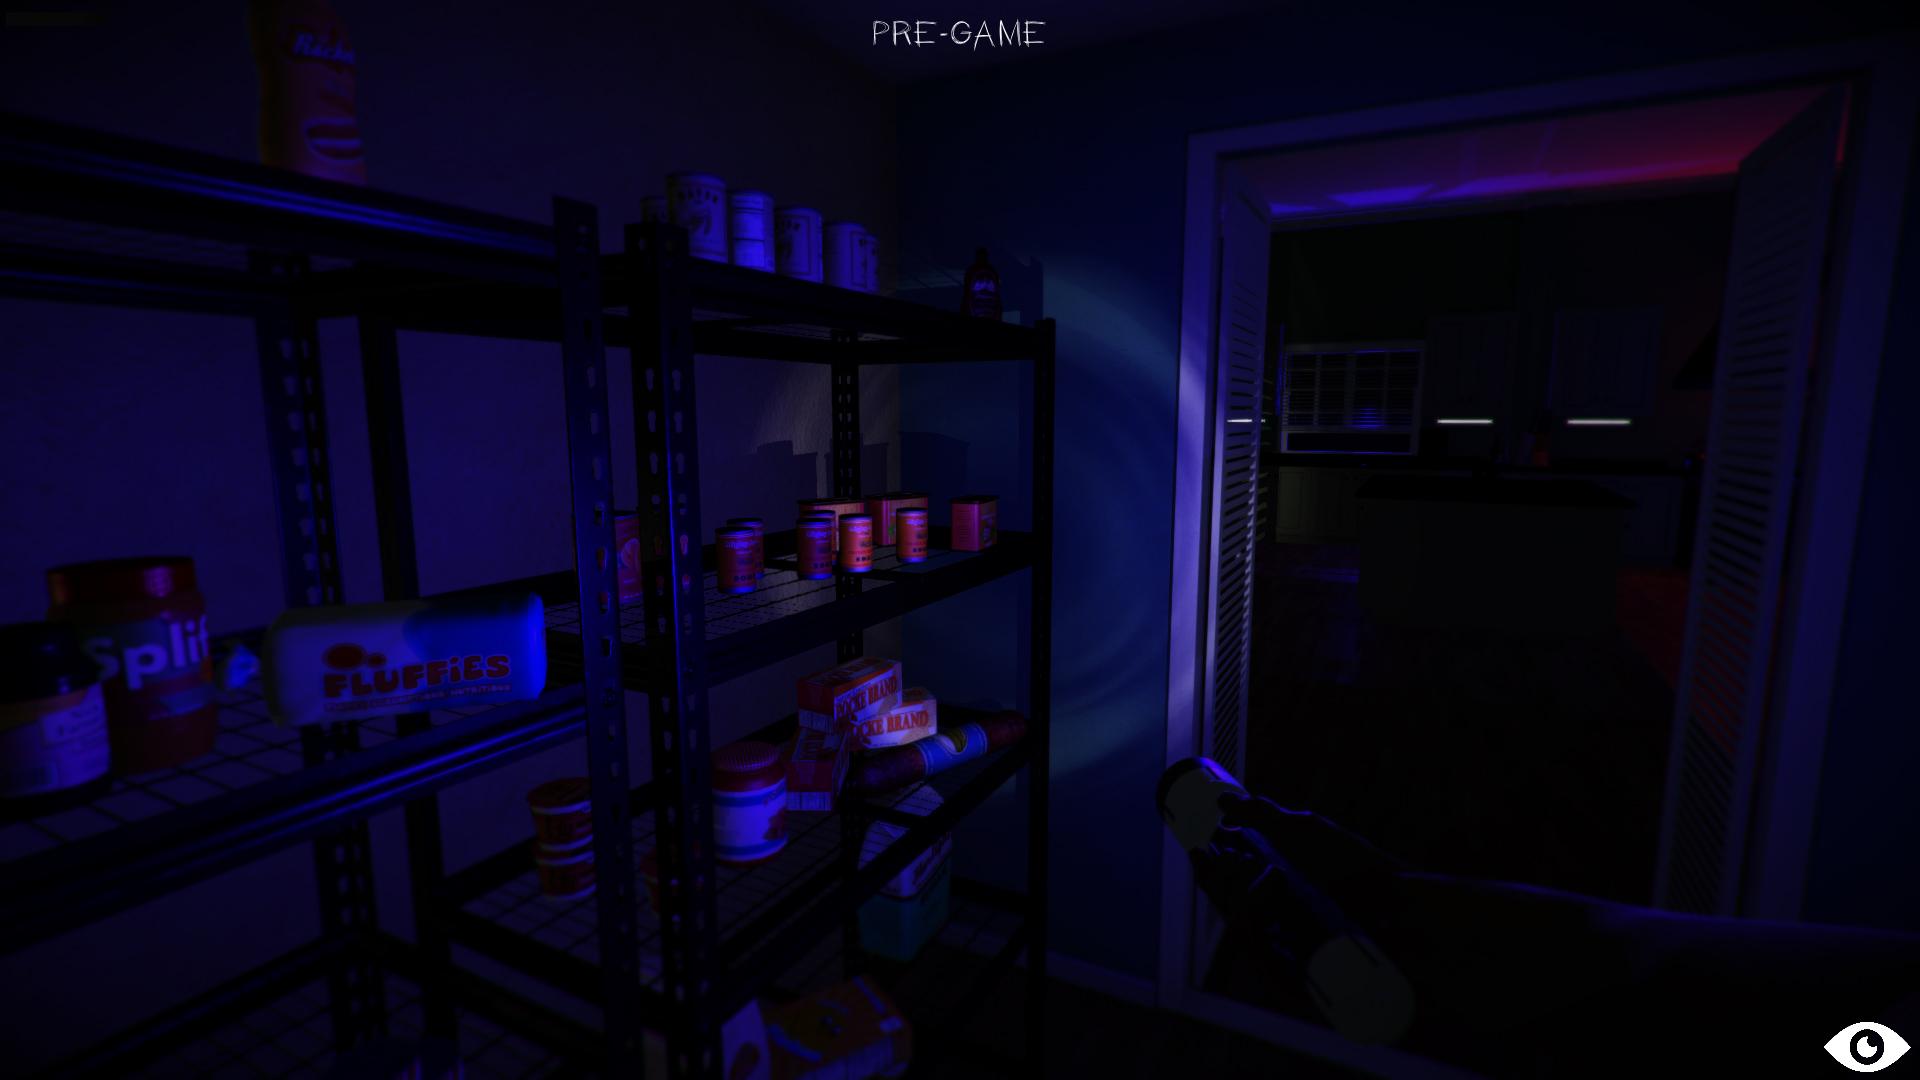 123-slaughter-me-street-2-setup-free-download